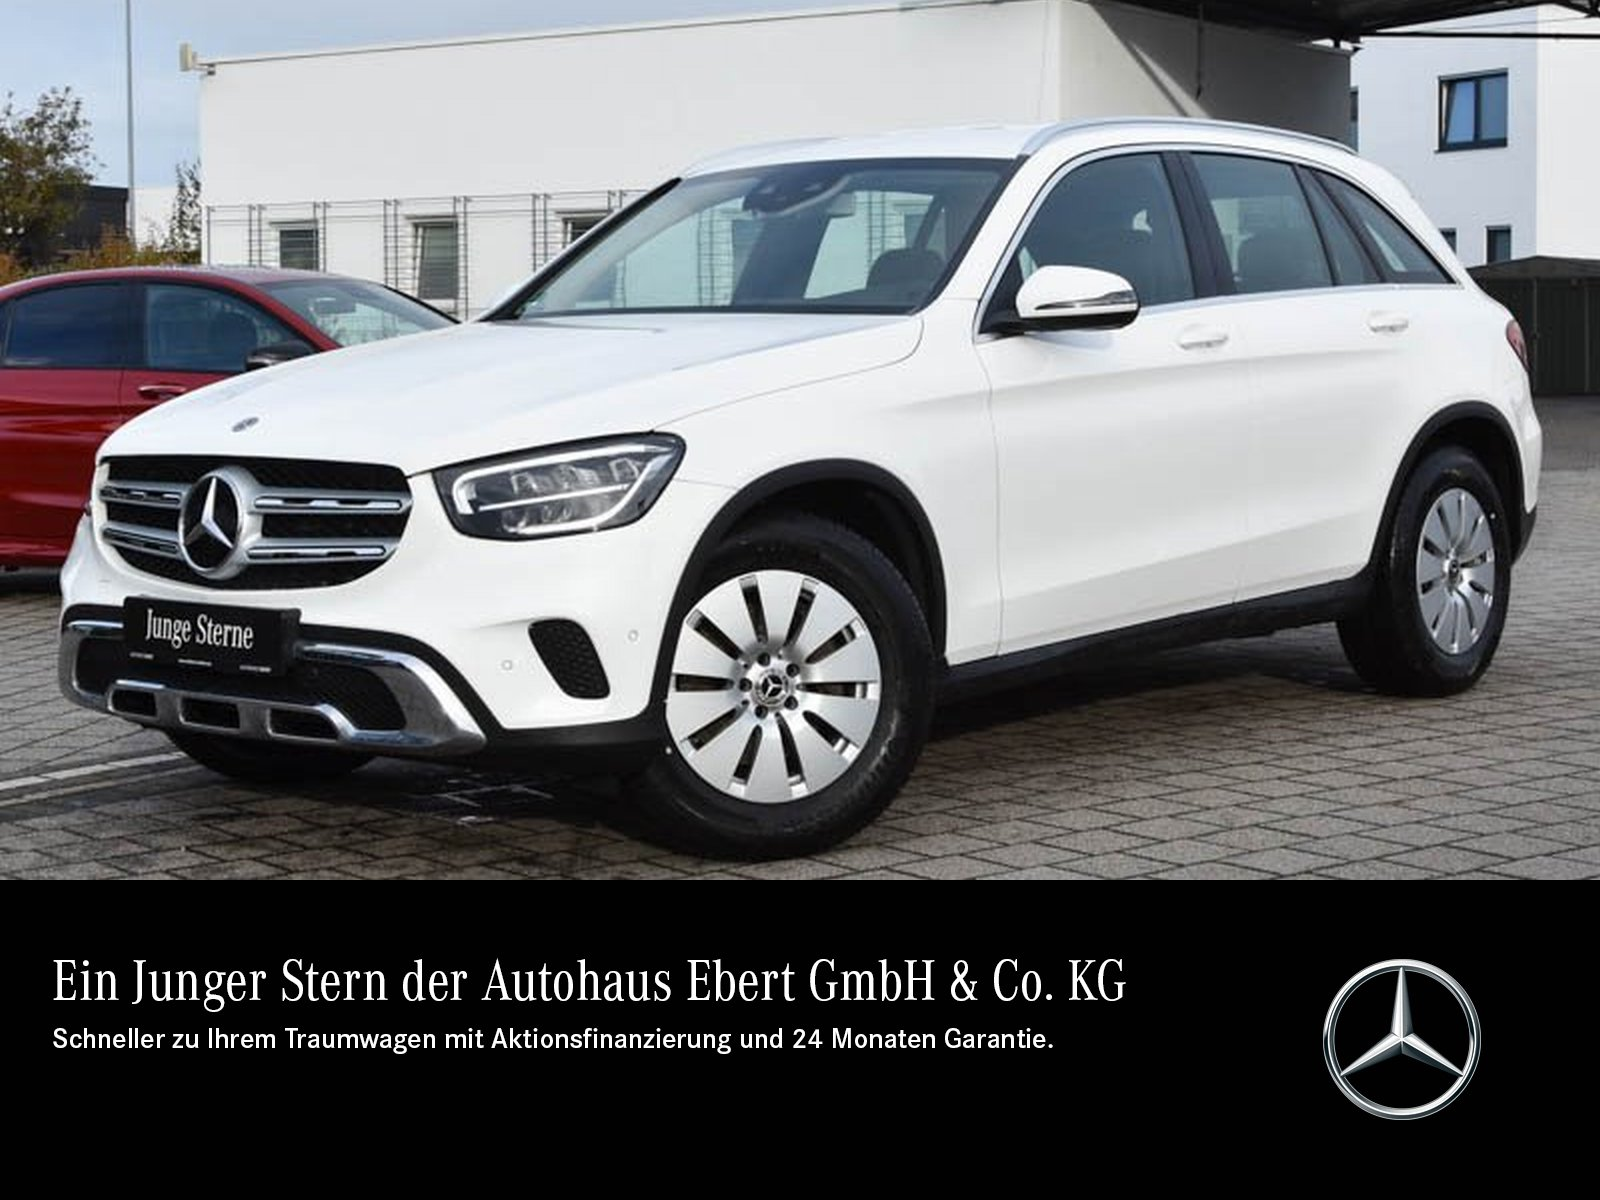 Mercedes-Benz GLC 200 4M 9G+NAVI-PREMIUM+AHK+LED+PTS+EASY-PACK, Jahr 2019, Benzin